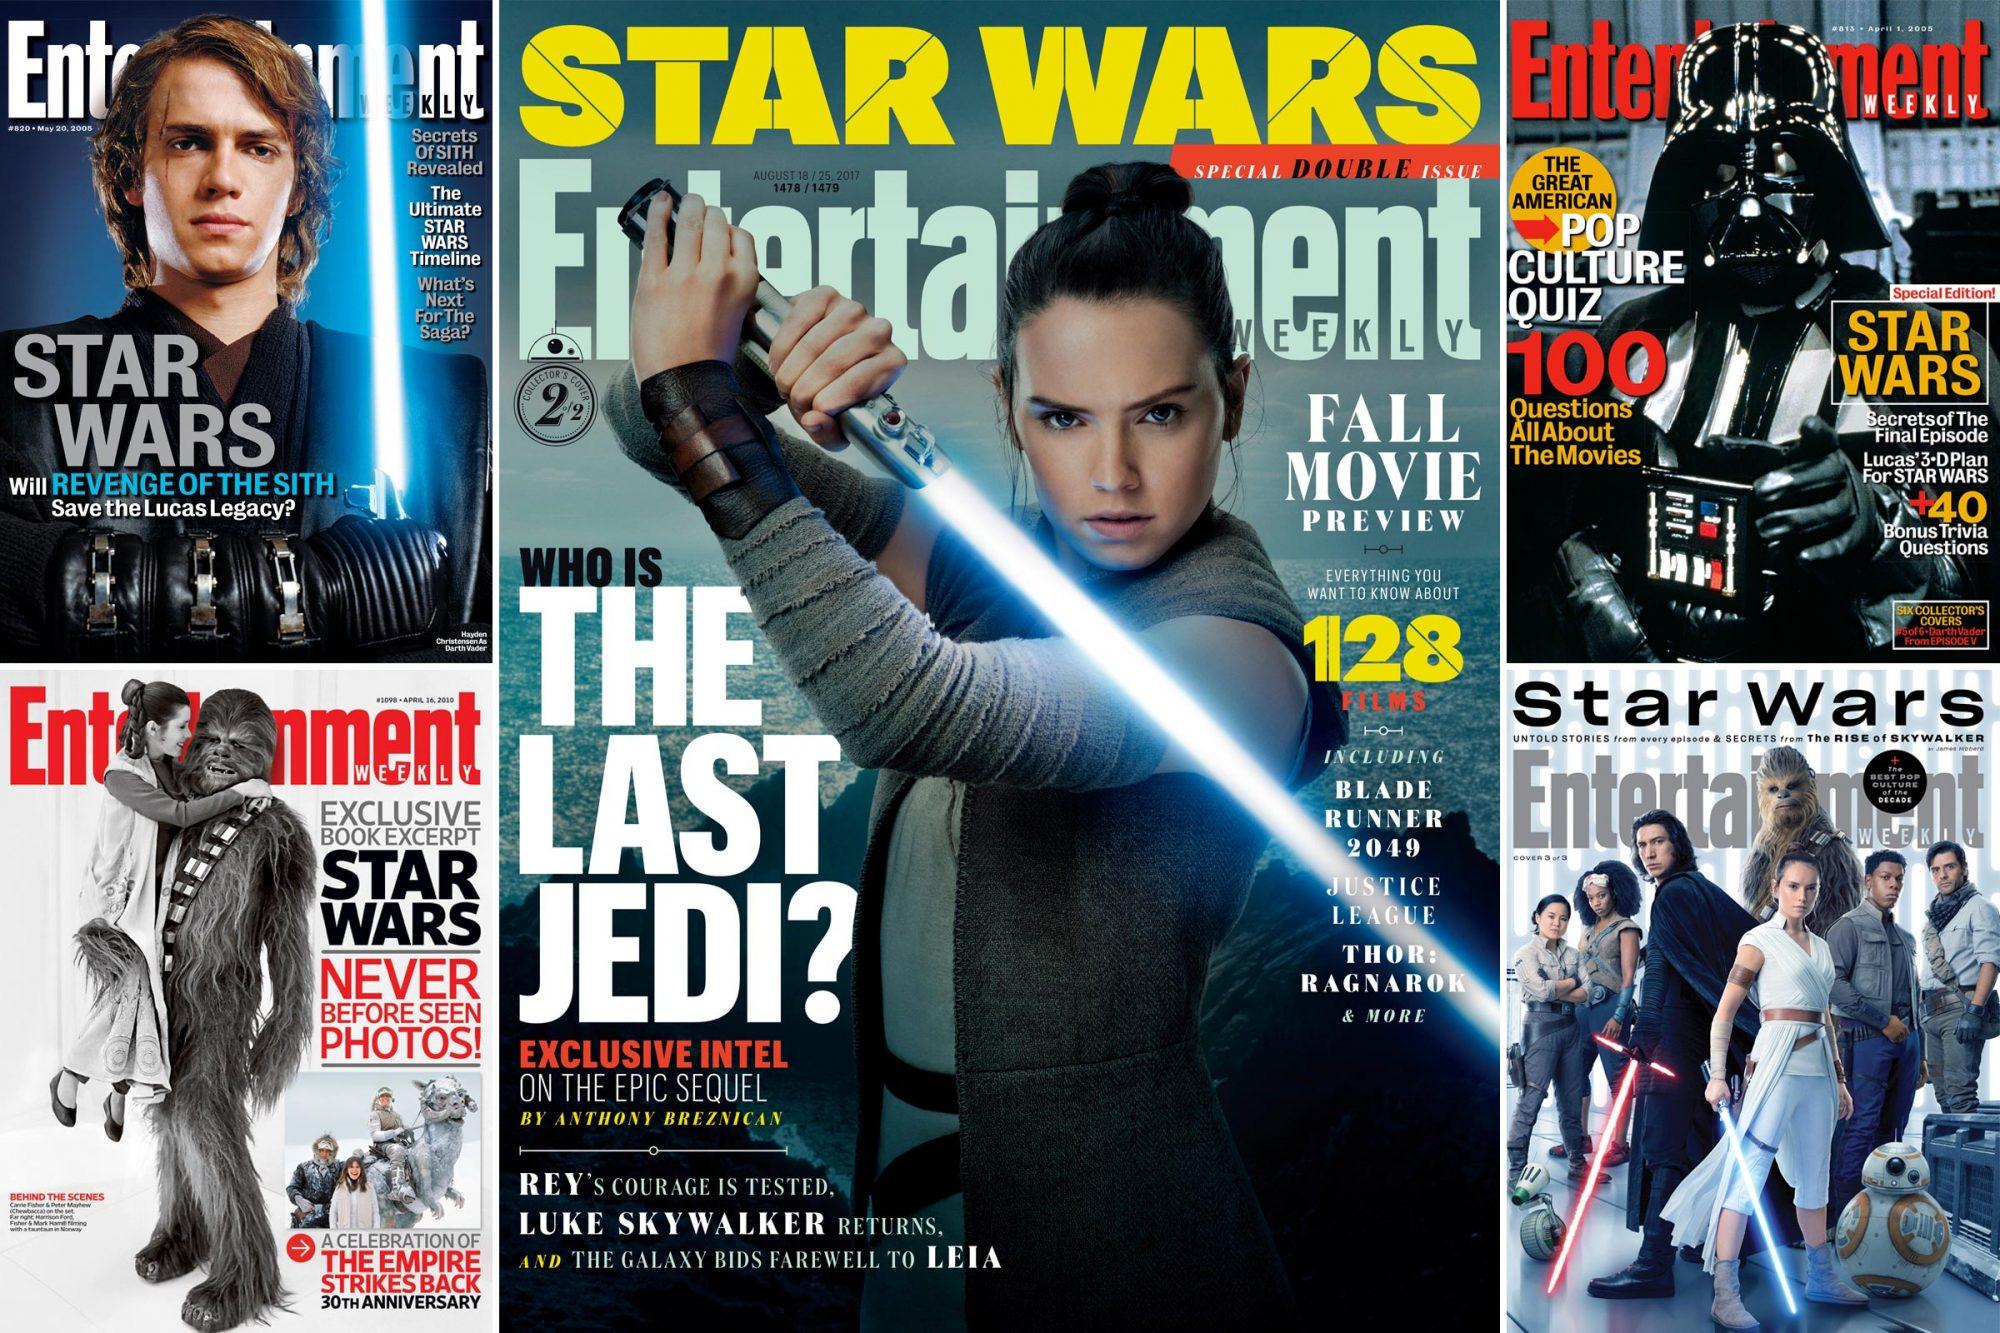 EW Star Wars Covers